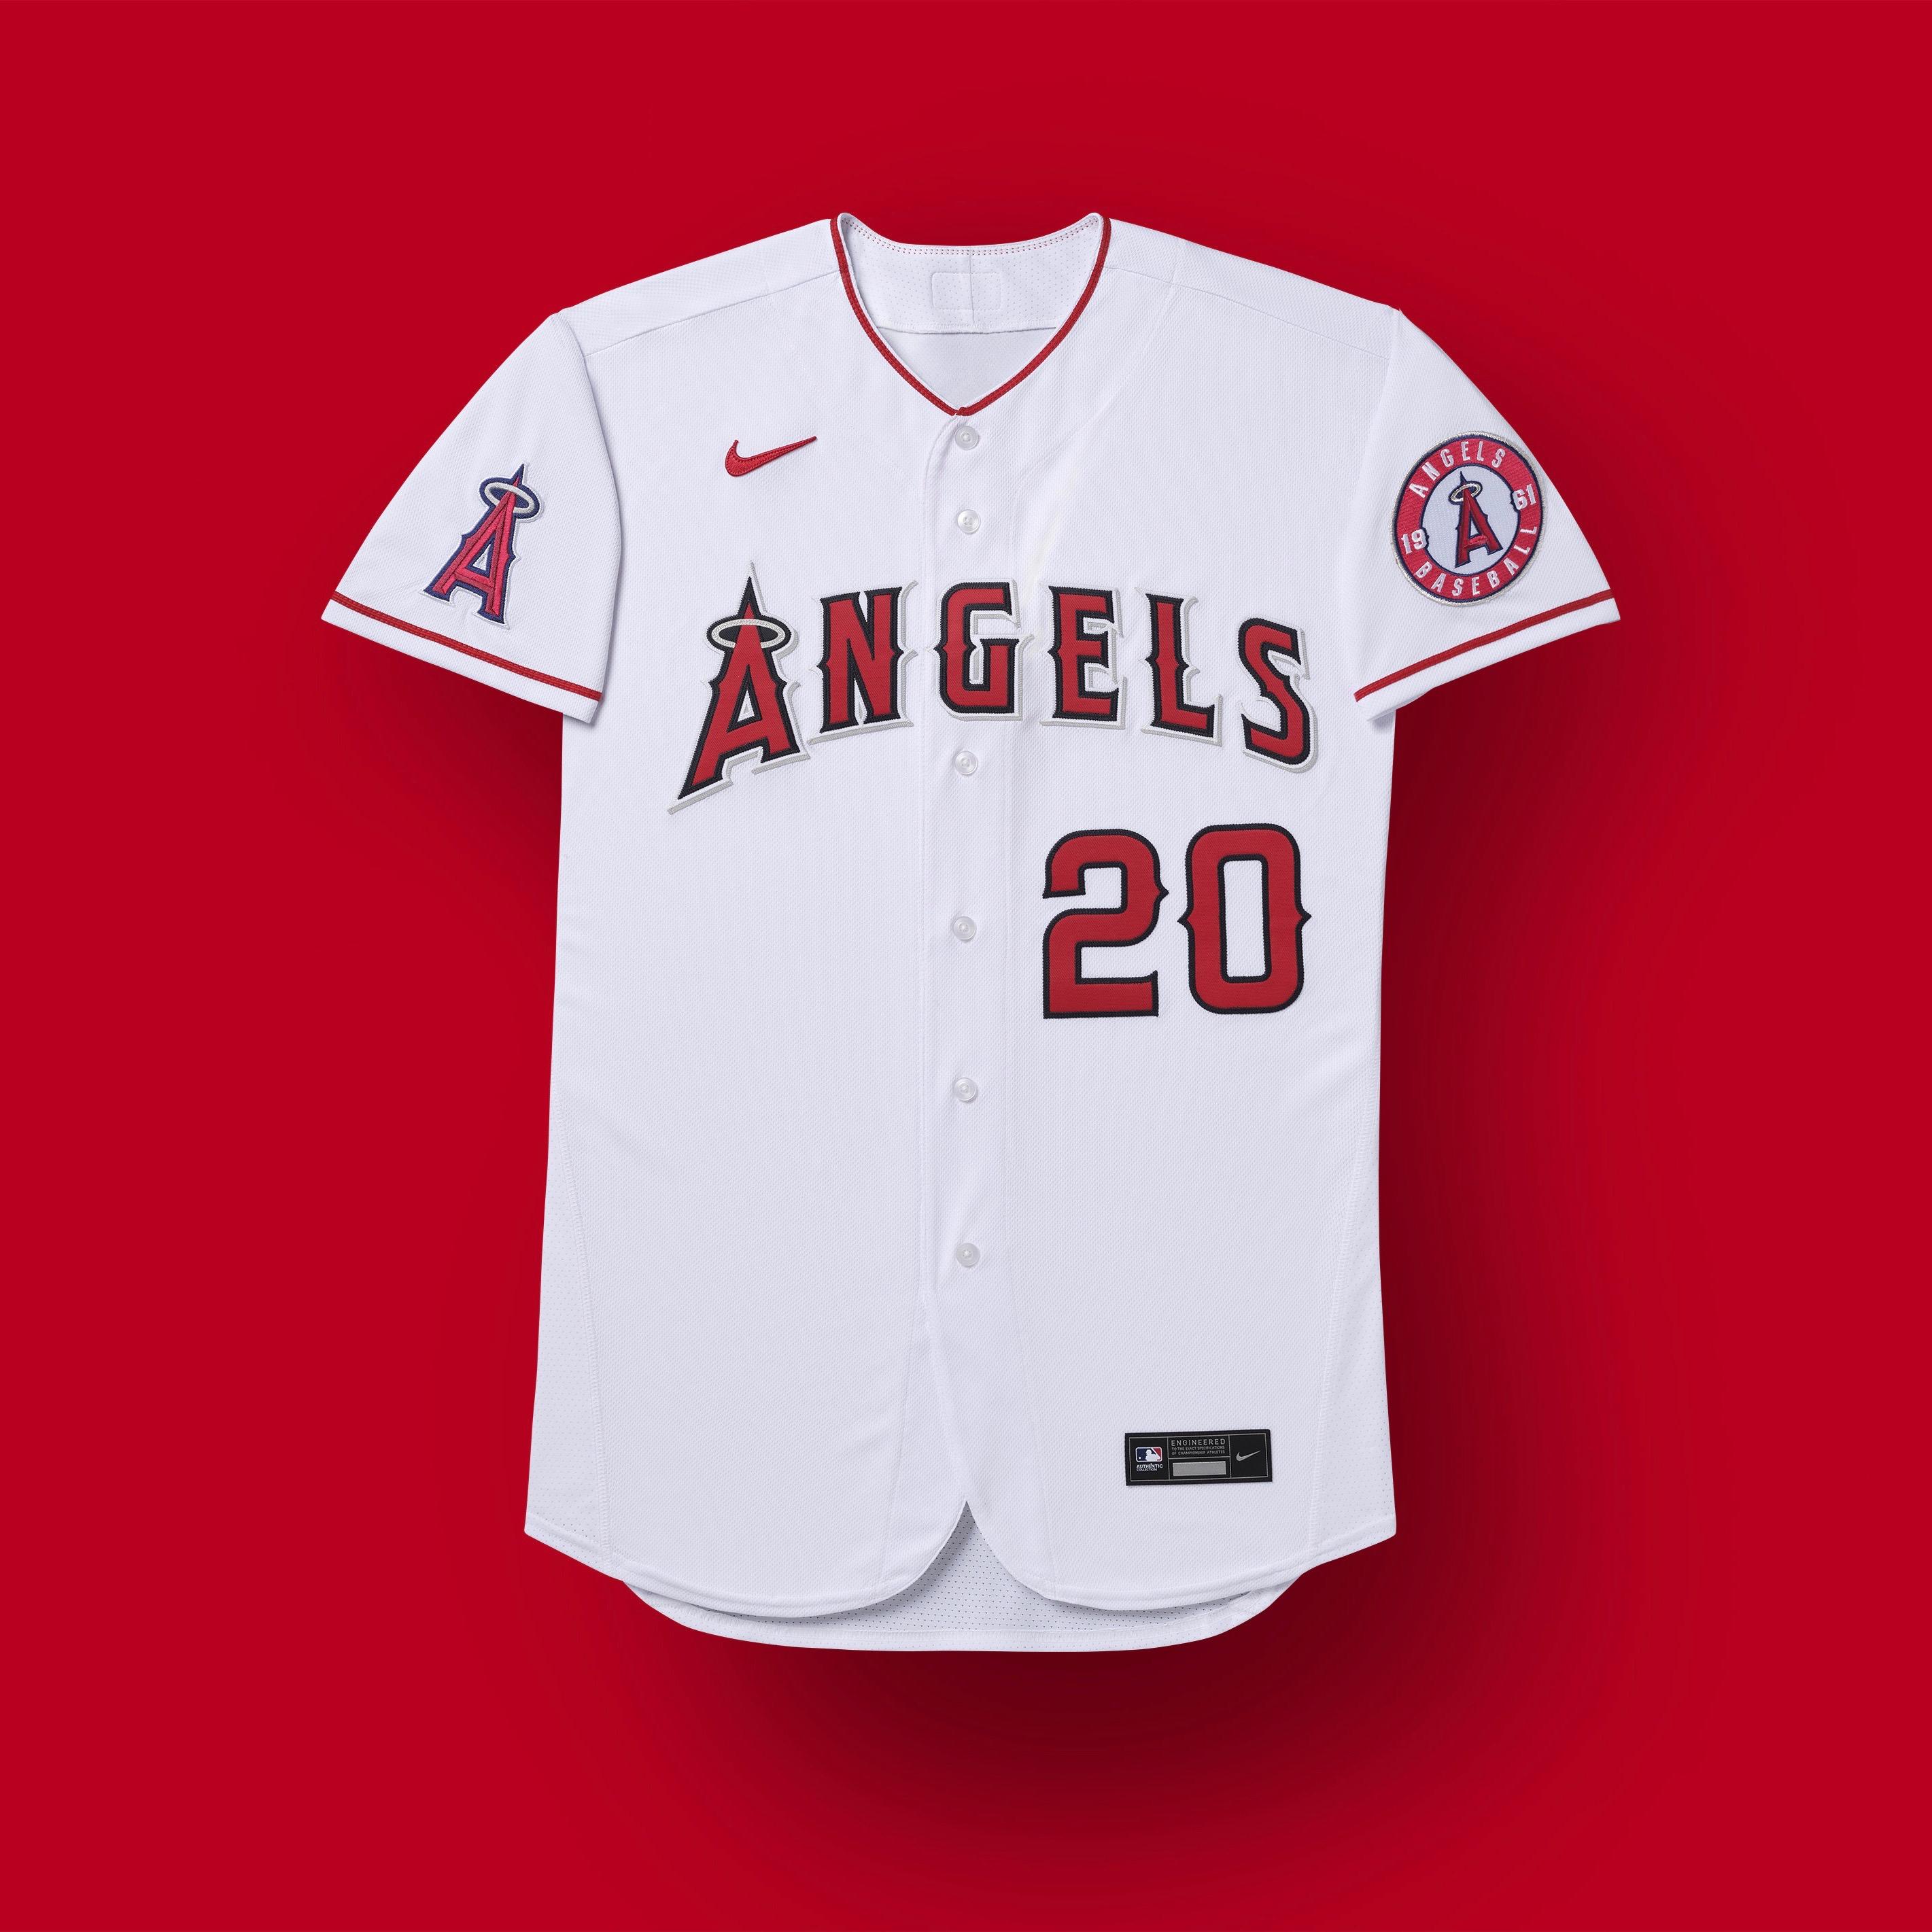 los angeles angels 2020 uniforms